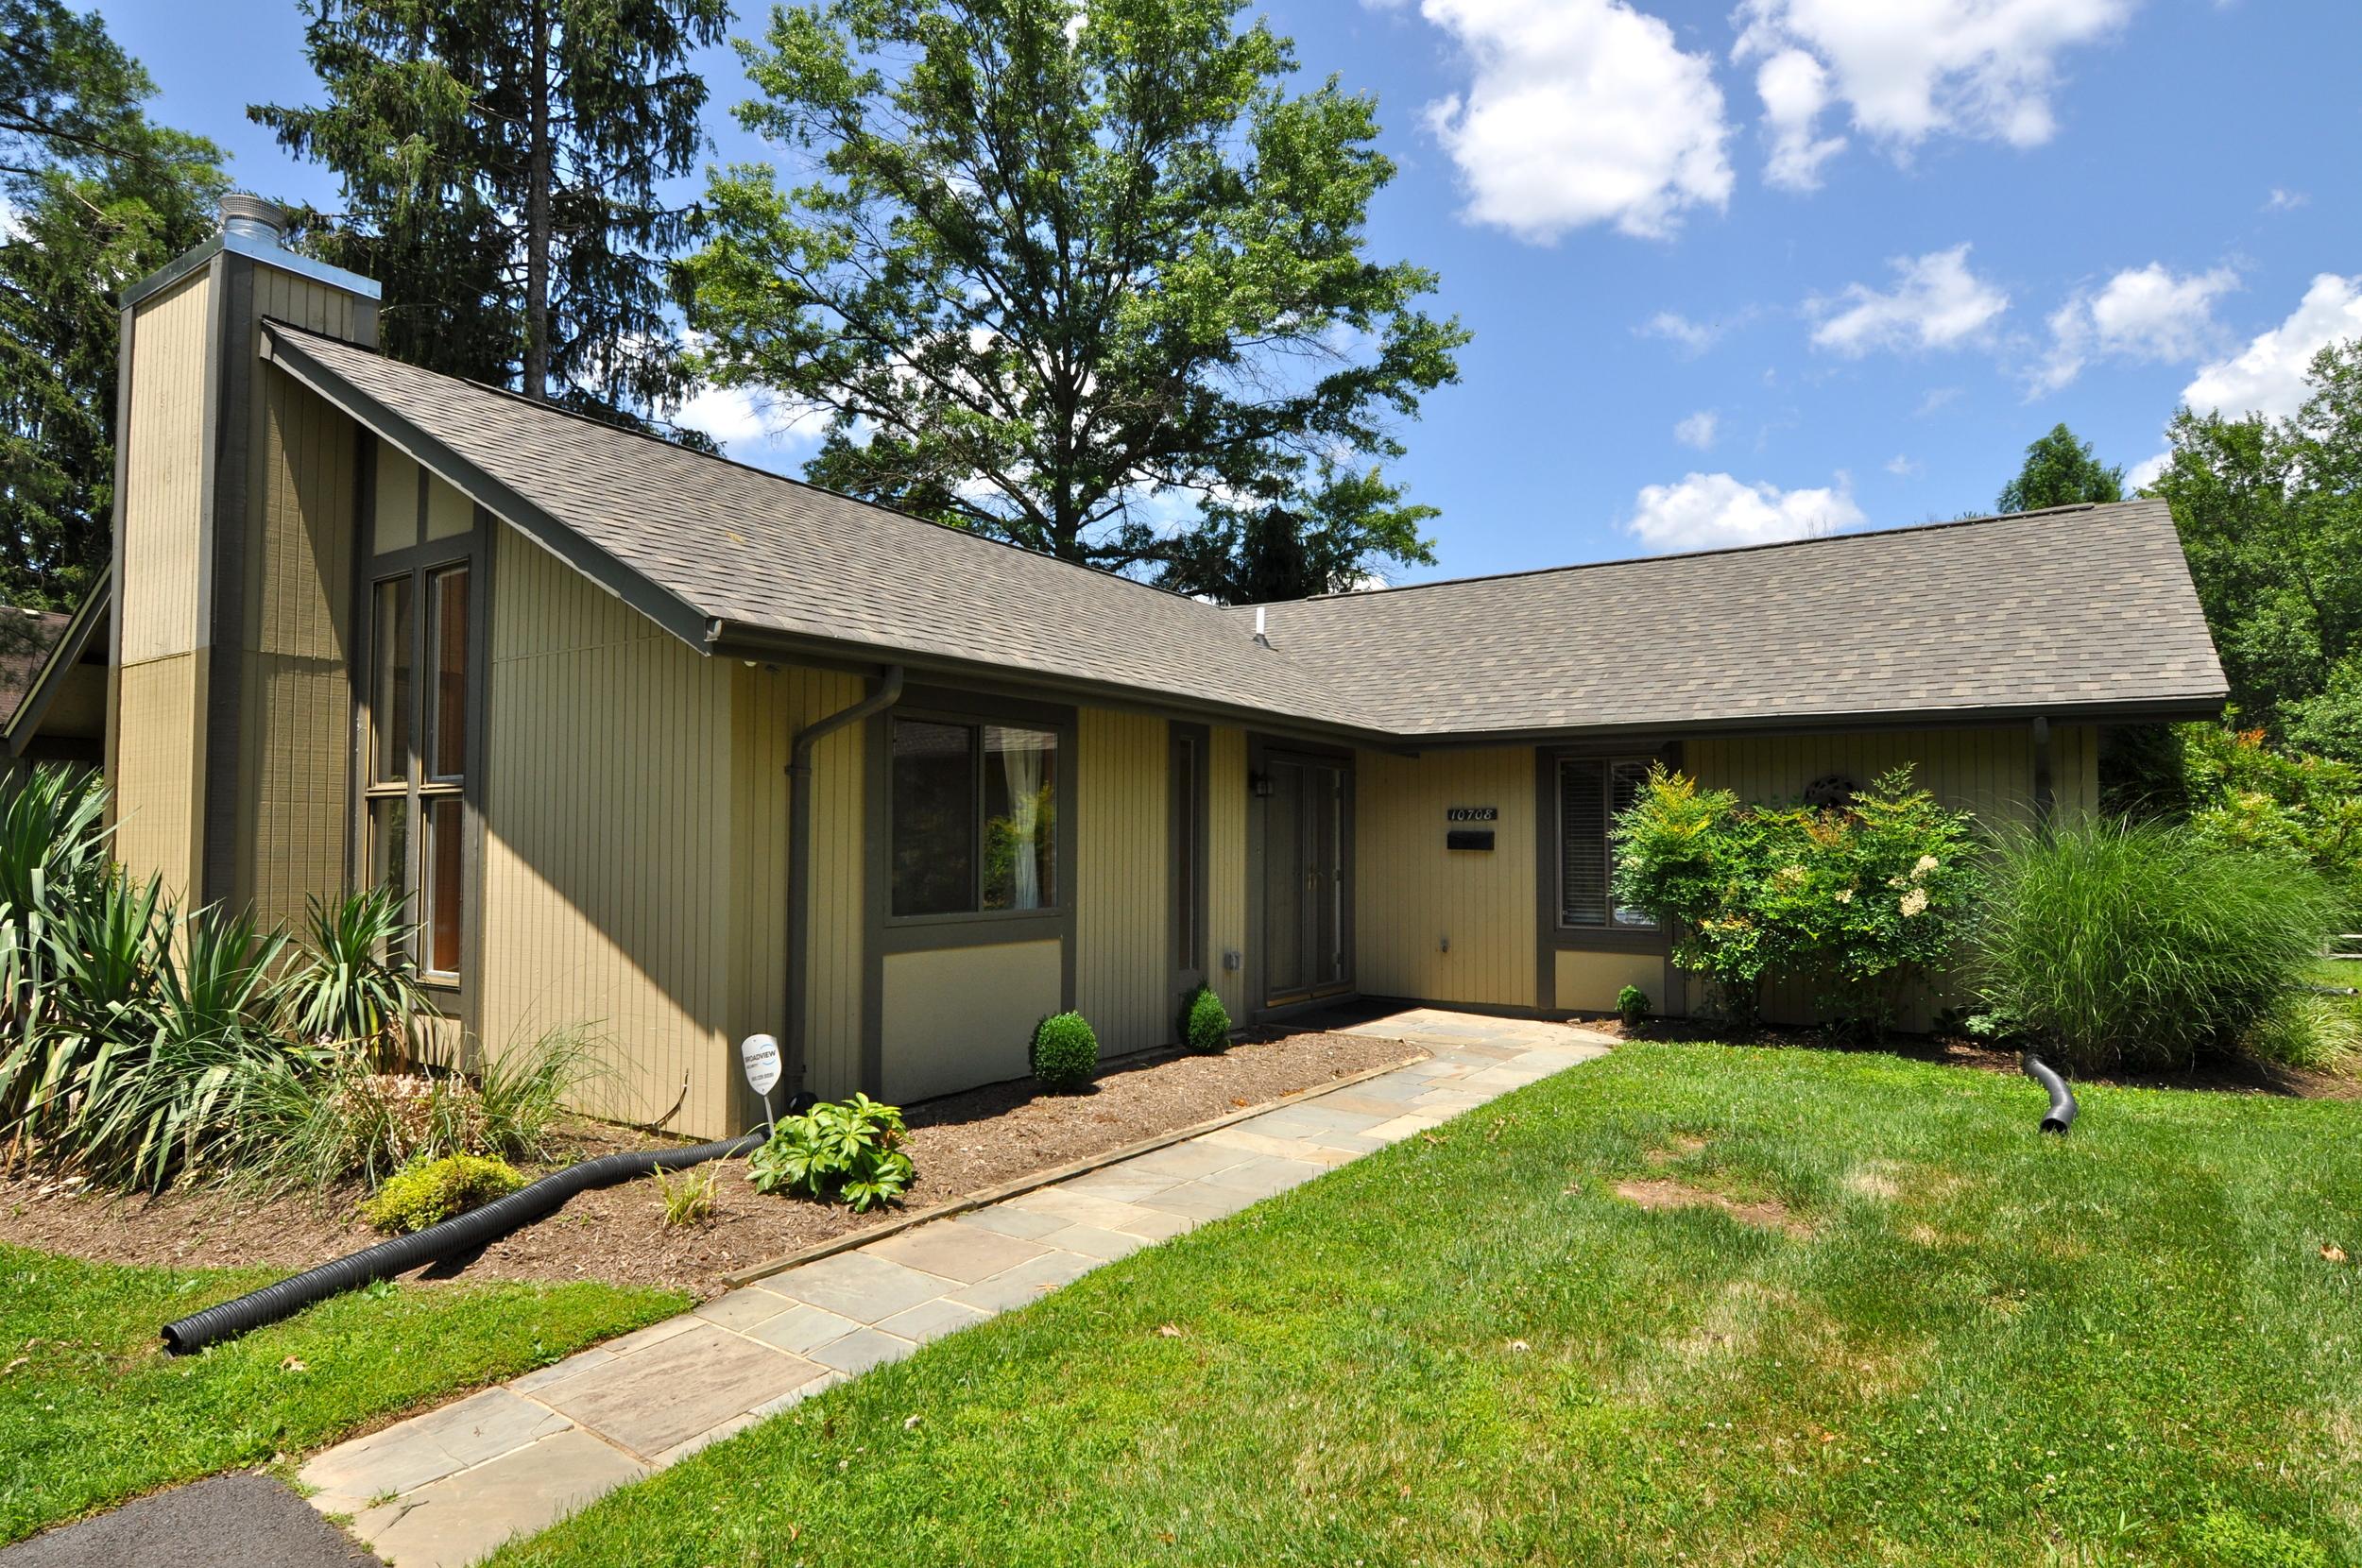 Sold Listing - Montgomery Village, MD